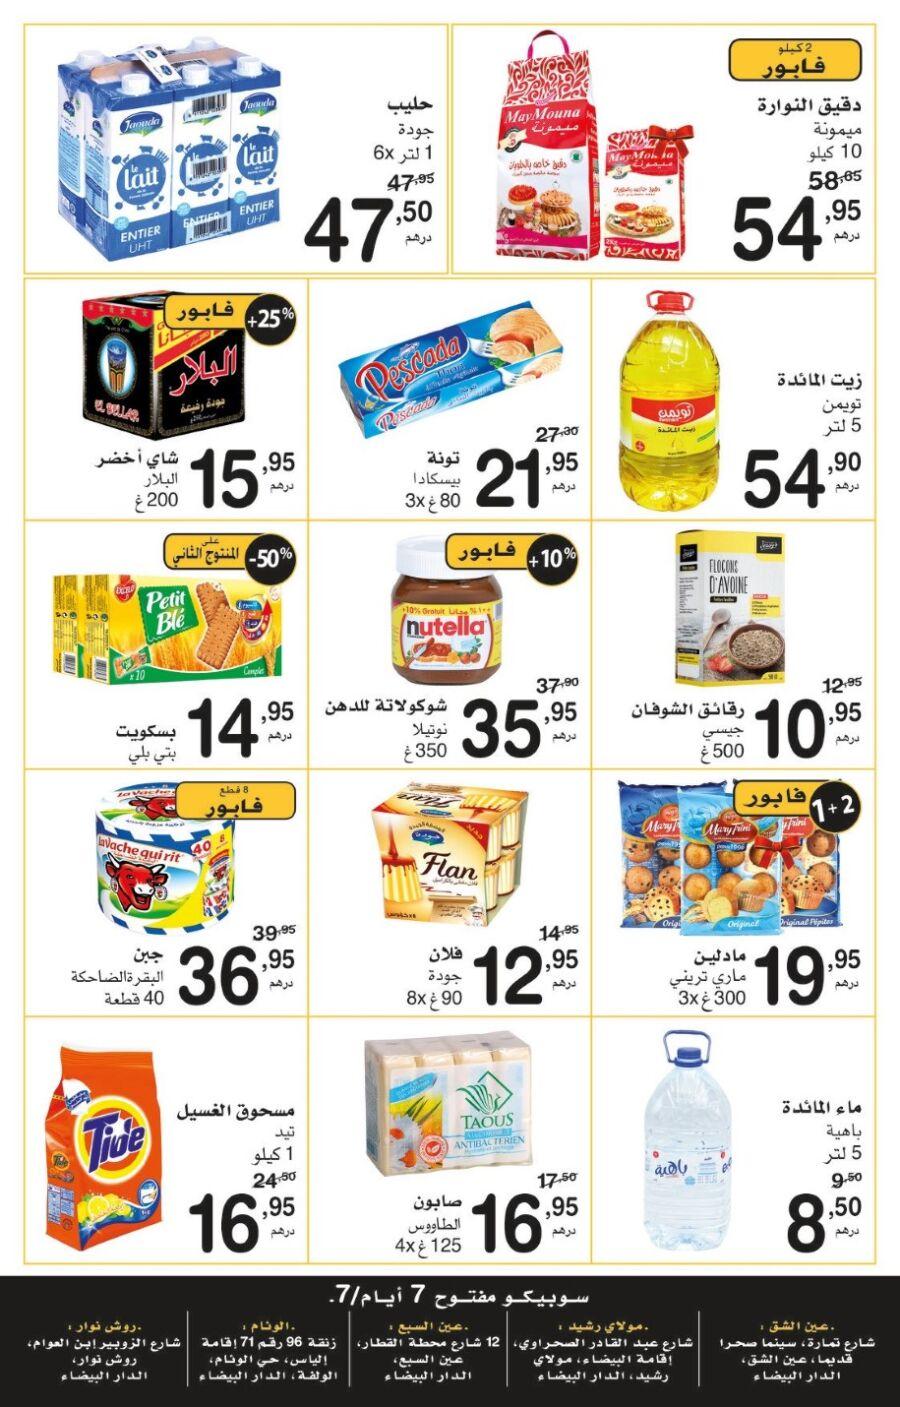 Catalogue Supeco Maroc أثمنة ديما رخيصة du 28 Janvier au 8 Février 2021